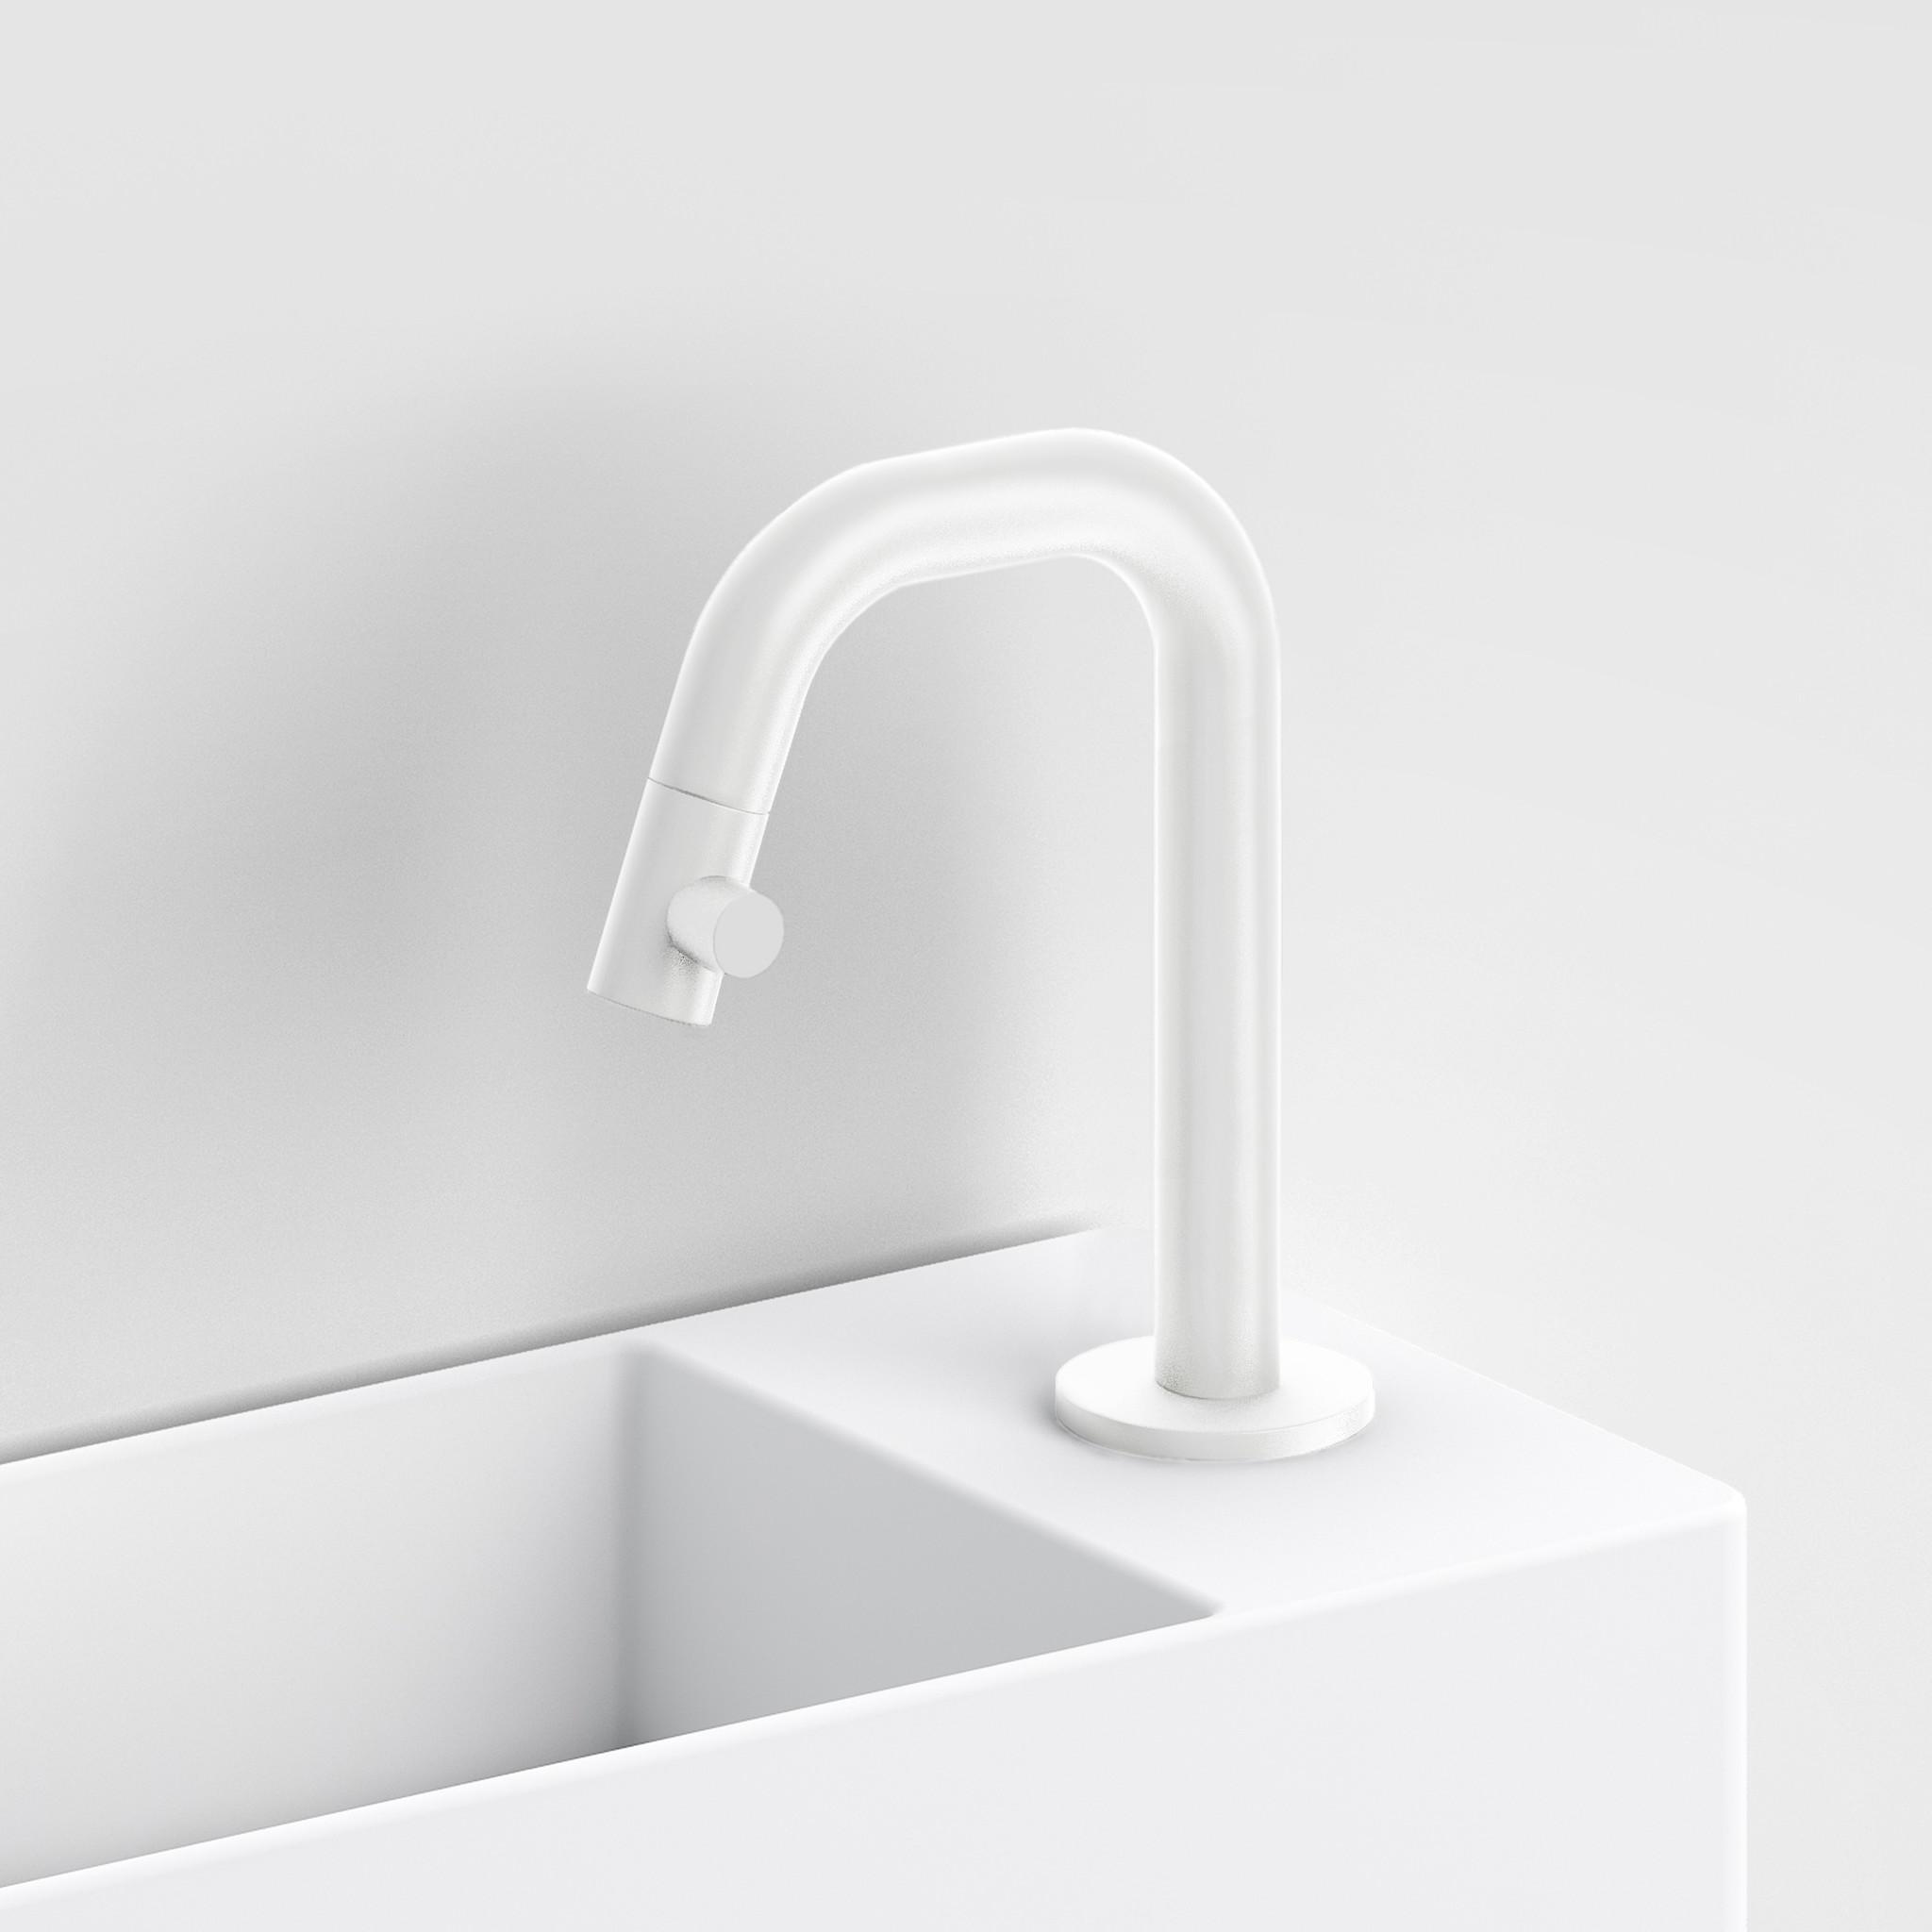 Kaldur Matt white Kaldur cold water tap and drain set